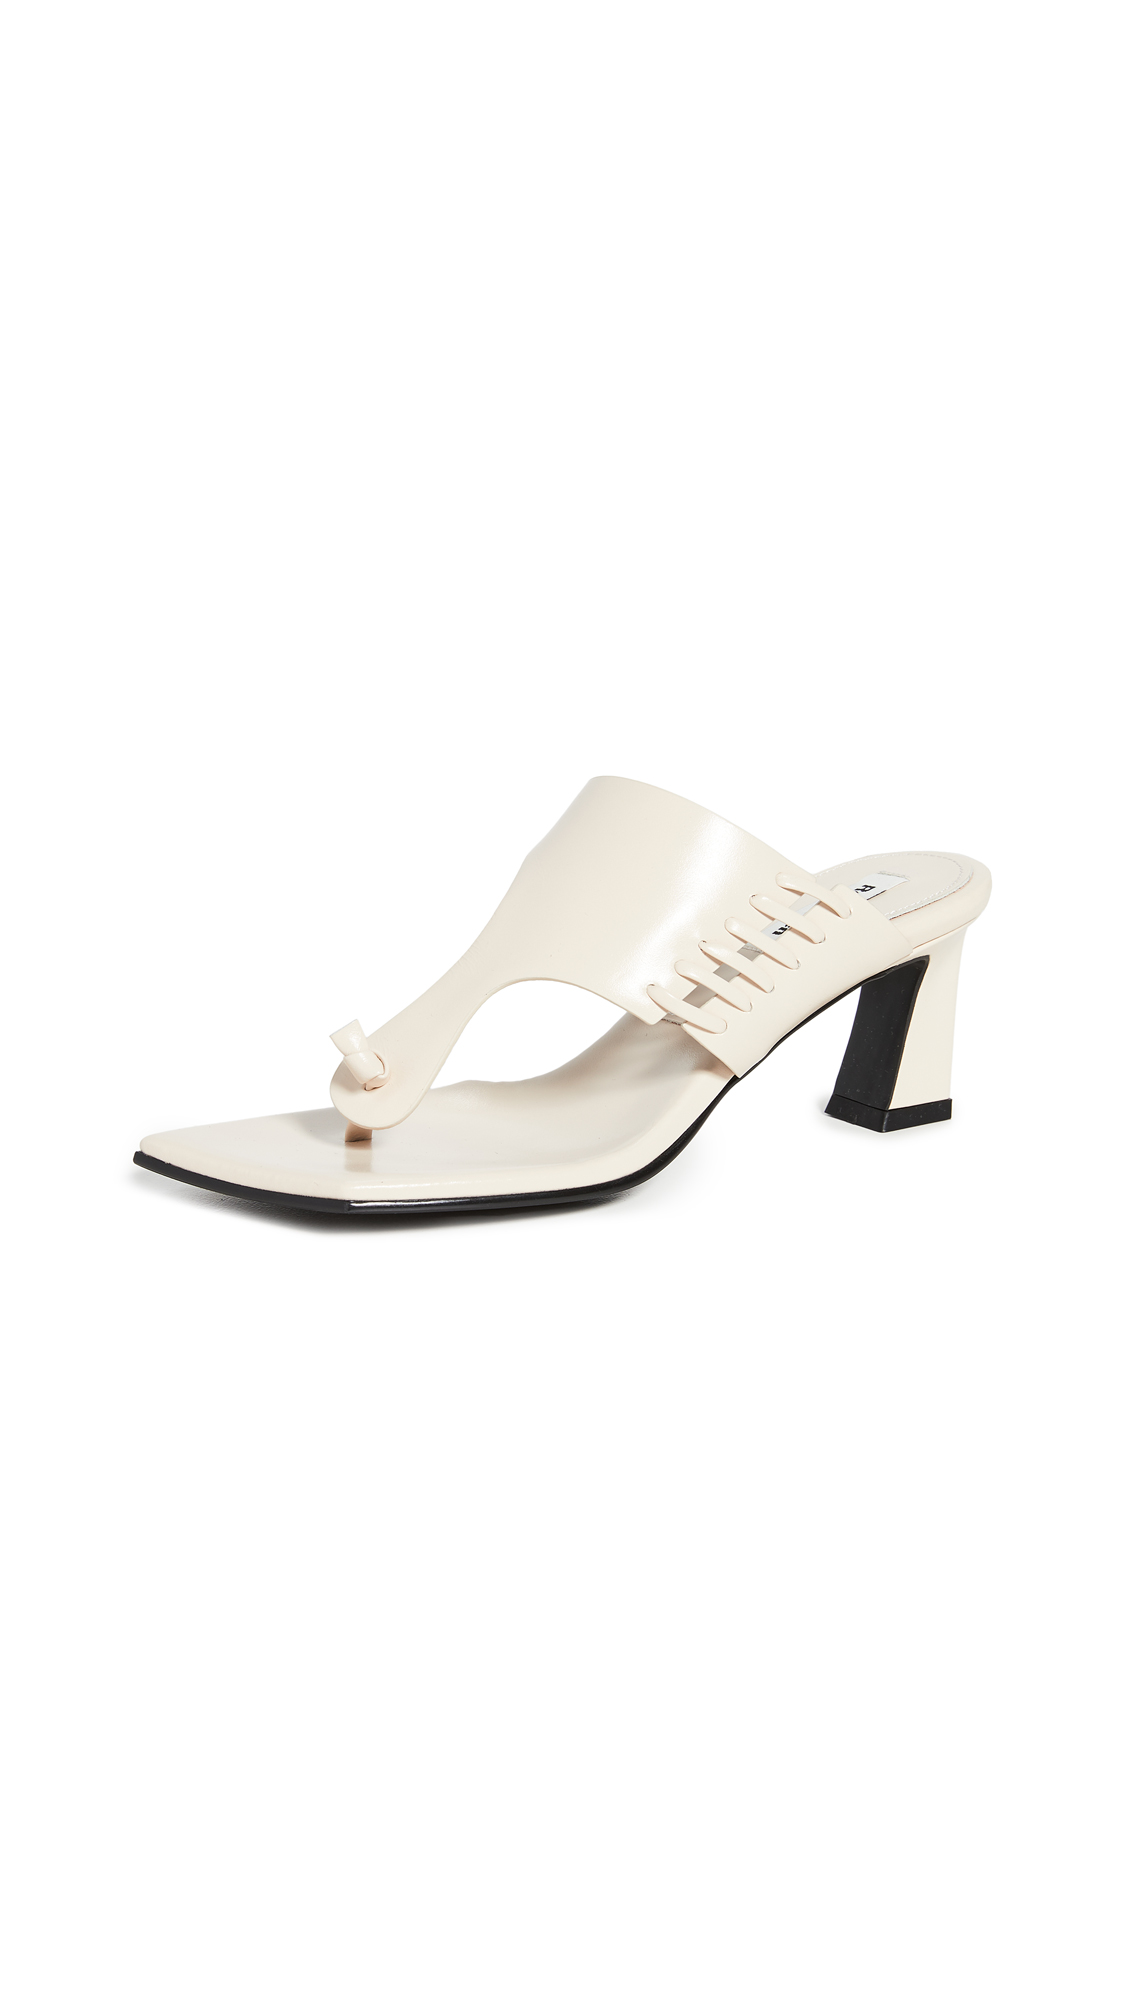 Reike Nen Stitch Flip-Flop Heels – 50% Off Sale